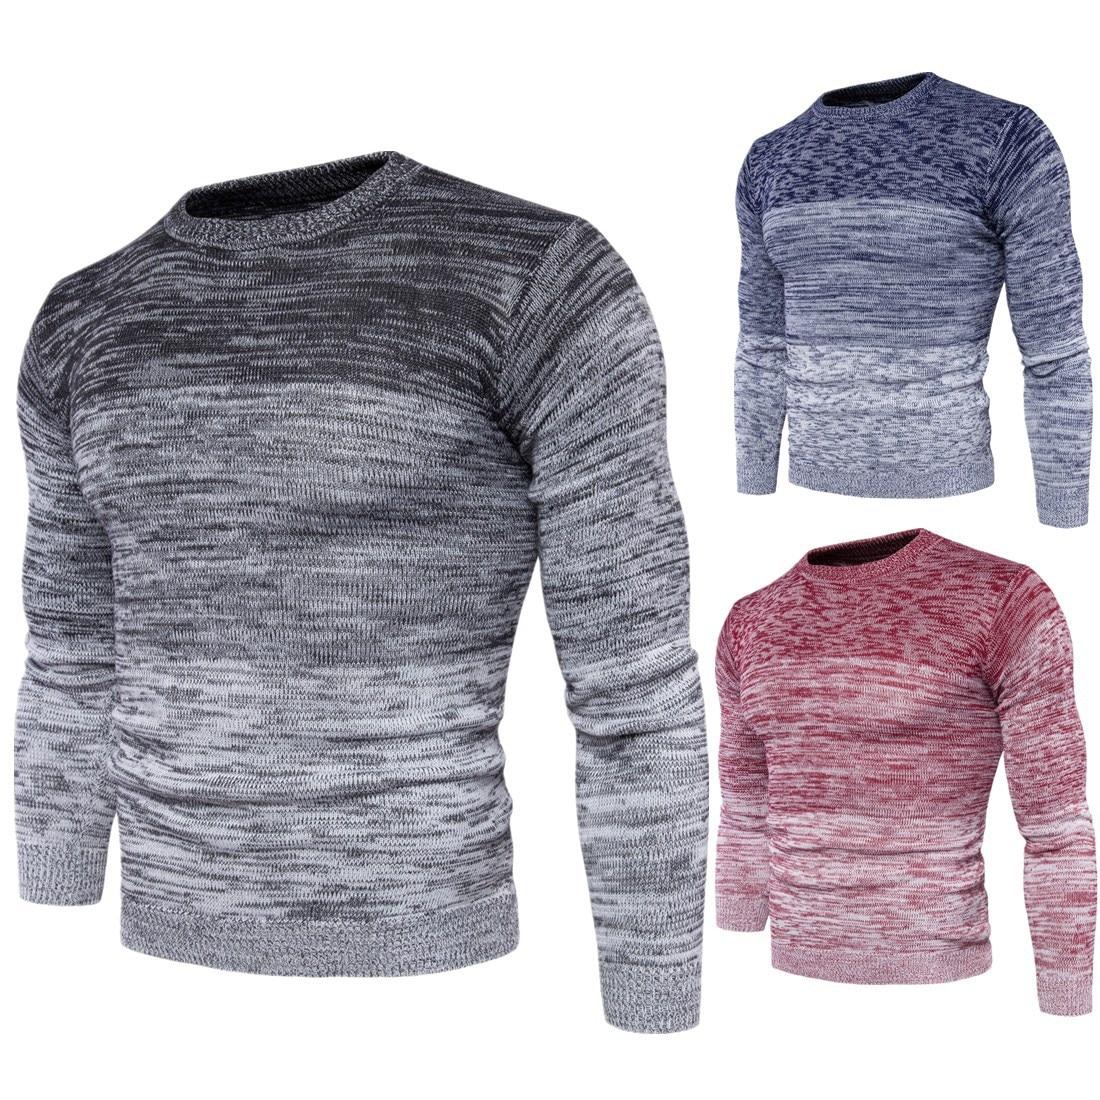 Sweater Men 2020 New Men's Knitting Sweater Coat Men's Sweater Q6263